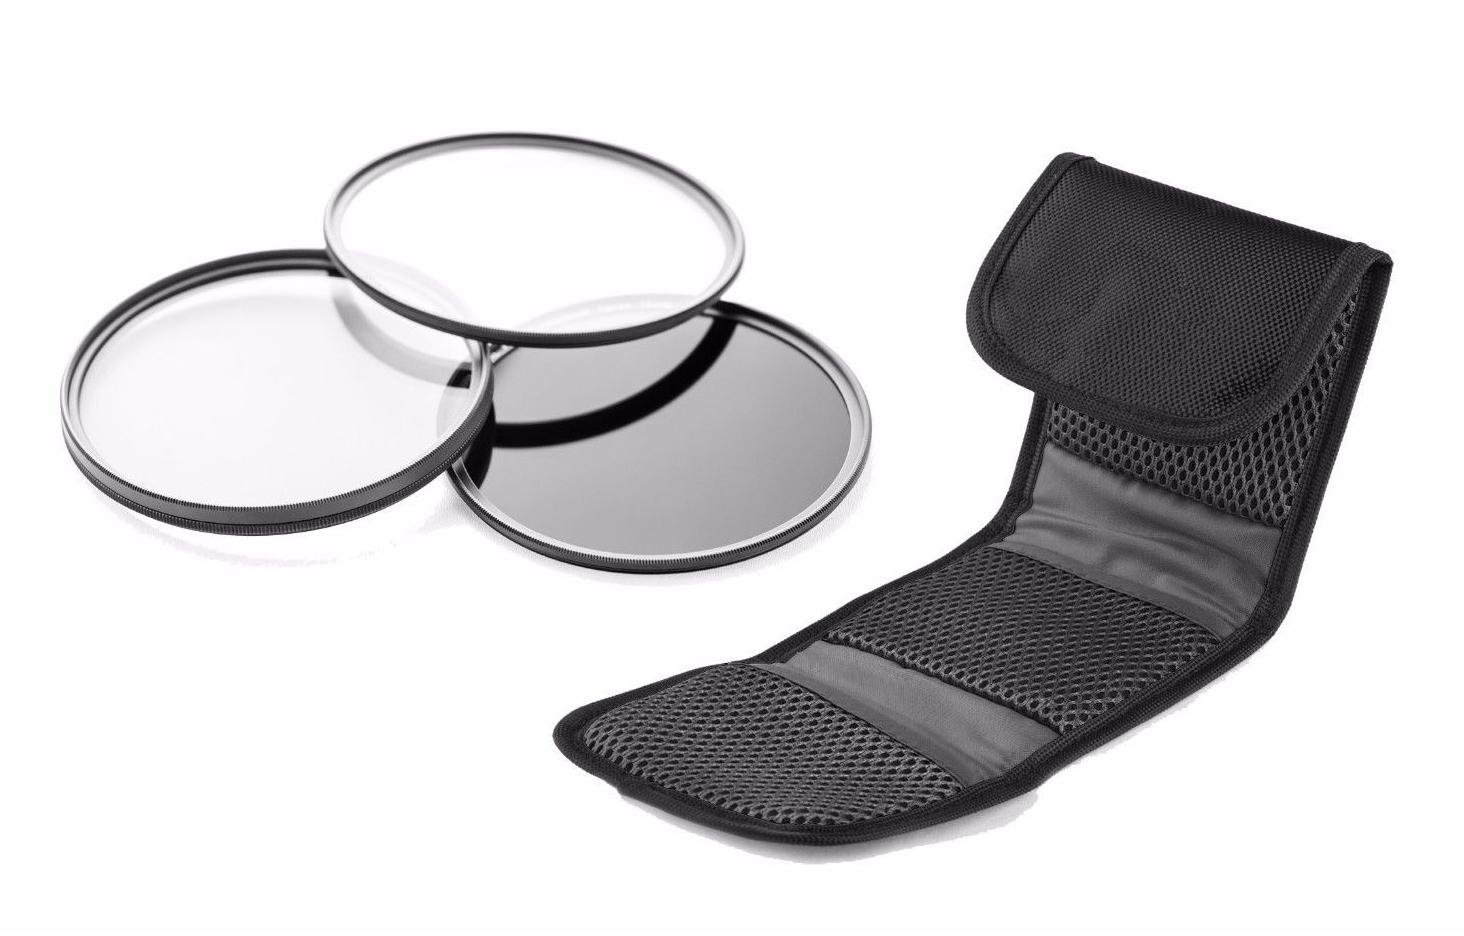 High Grade Multi-Coated + Ring Multi-Threaded 52mm K 41.5-52mm + Lens Cap + Nw Direct Microfiber Cleaning Cloth 52mm Panasonic HDC-TM90 3 Piece Lens Filter Kit